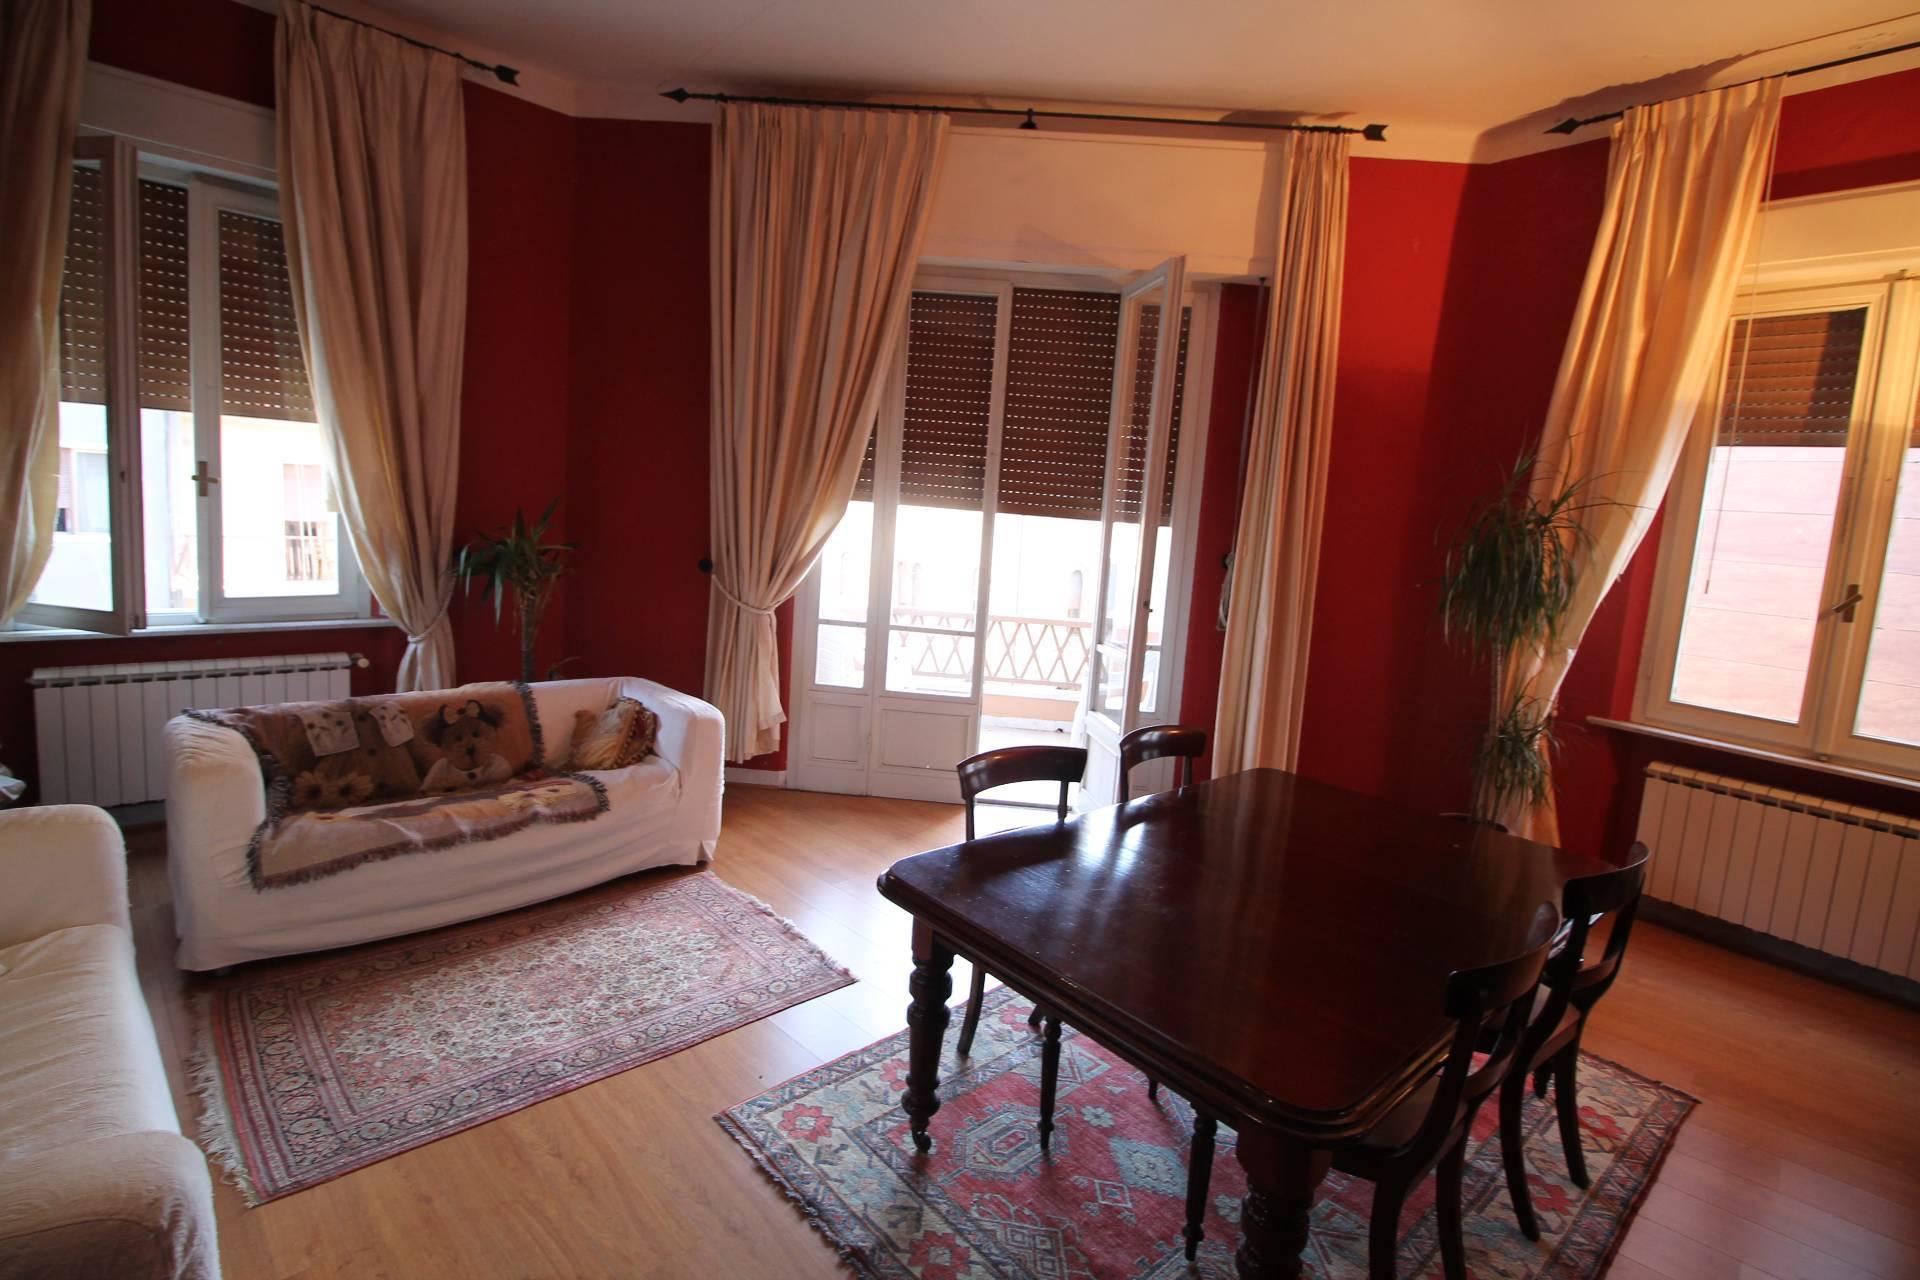 Appartamento in vendita, rif. V2875B